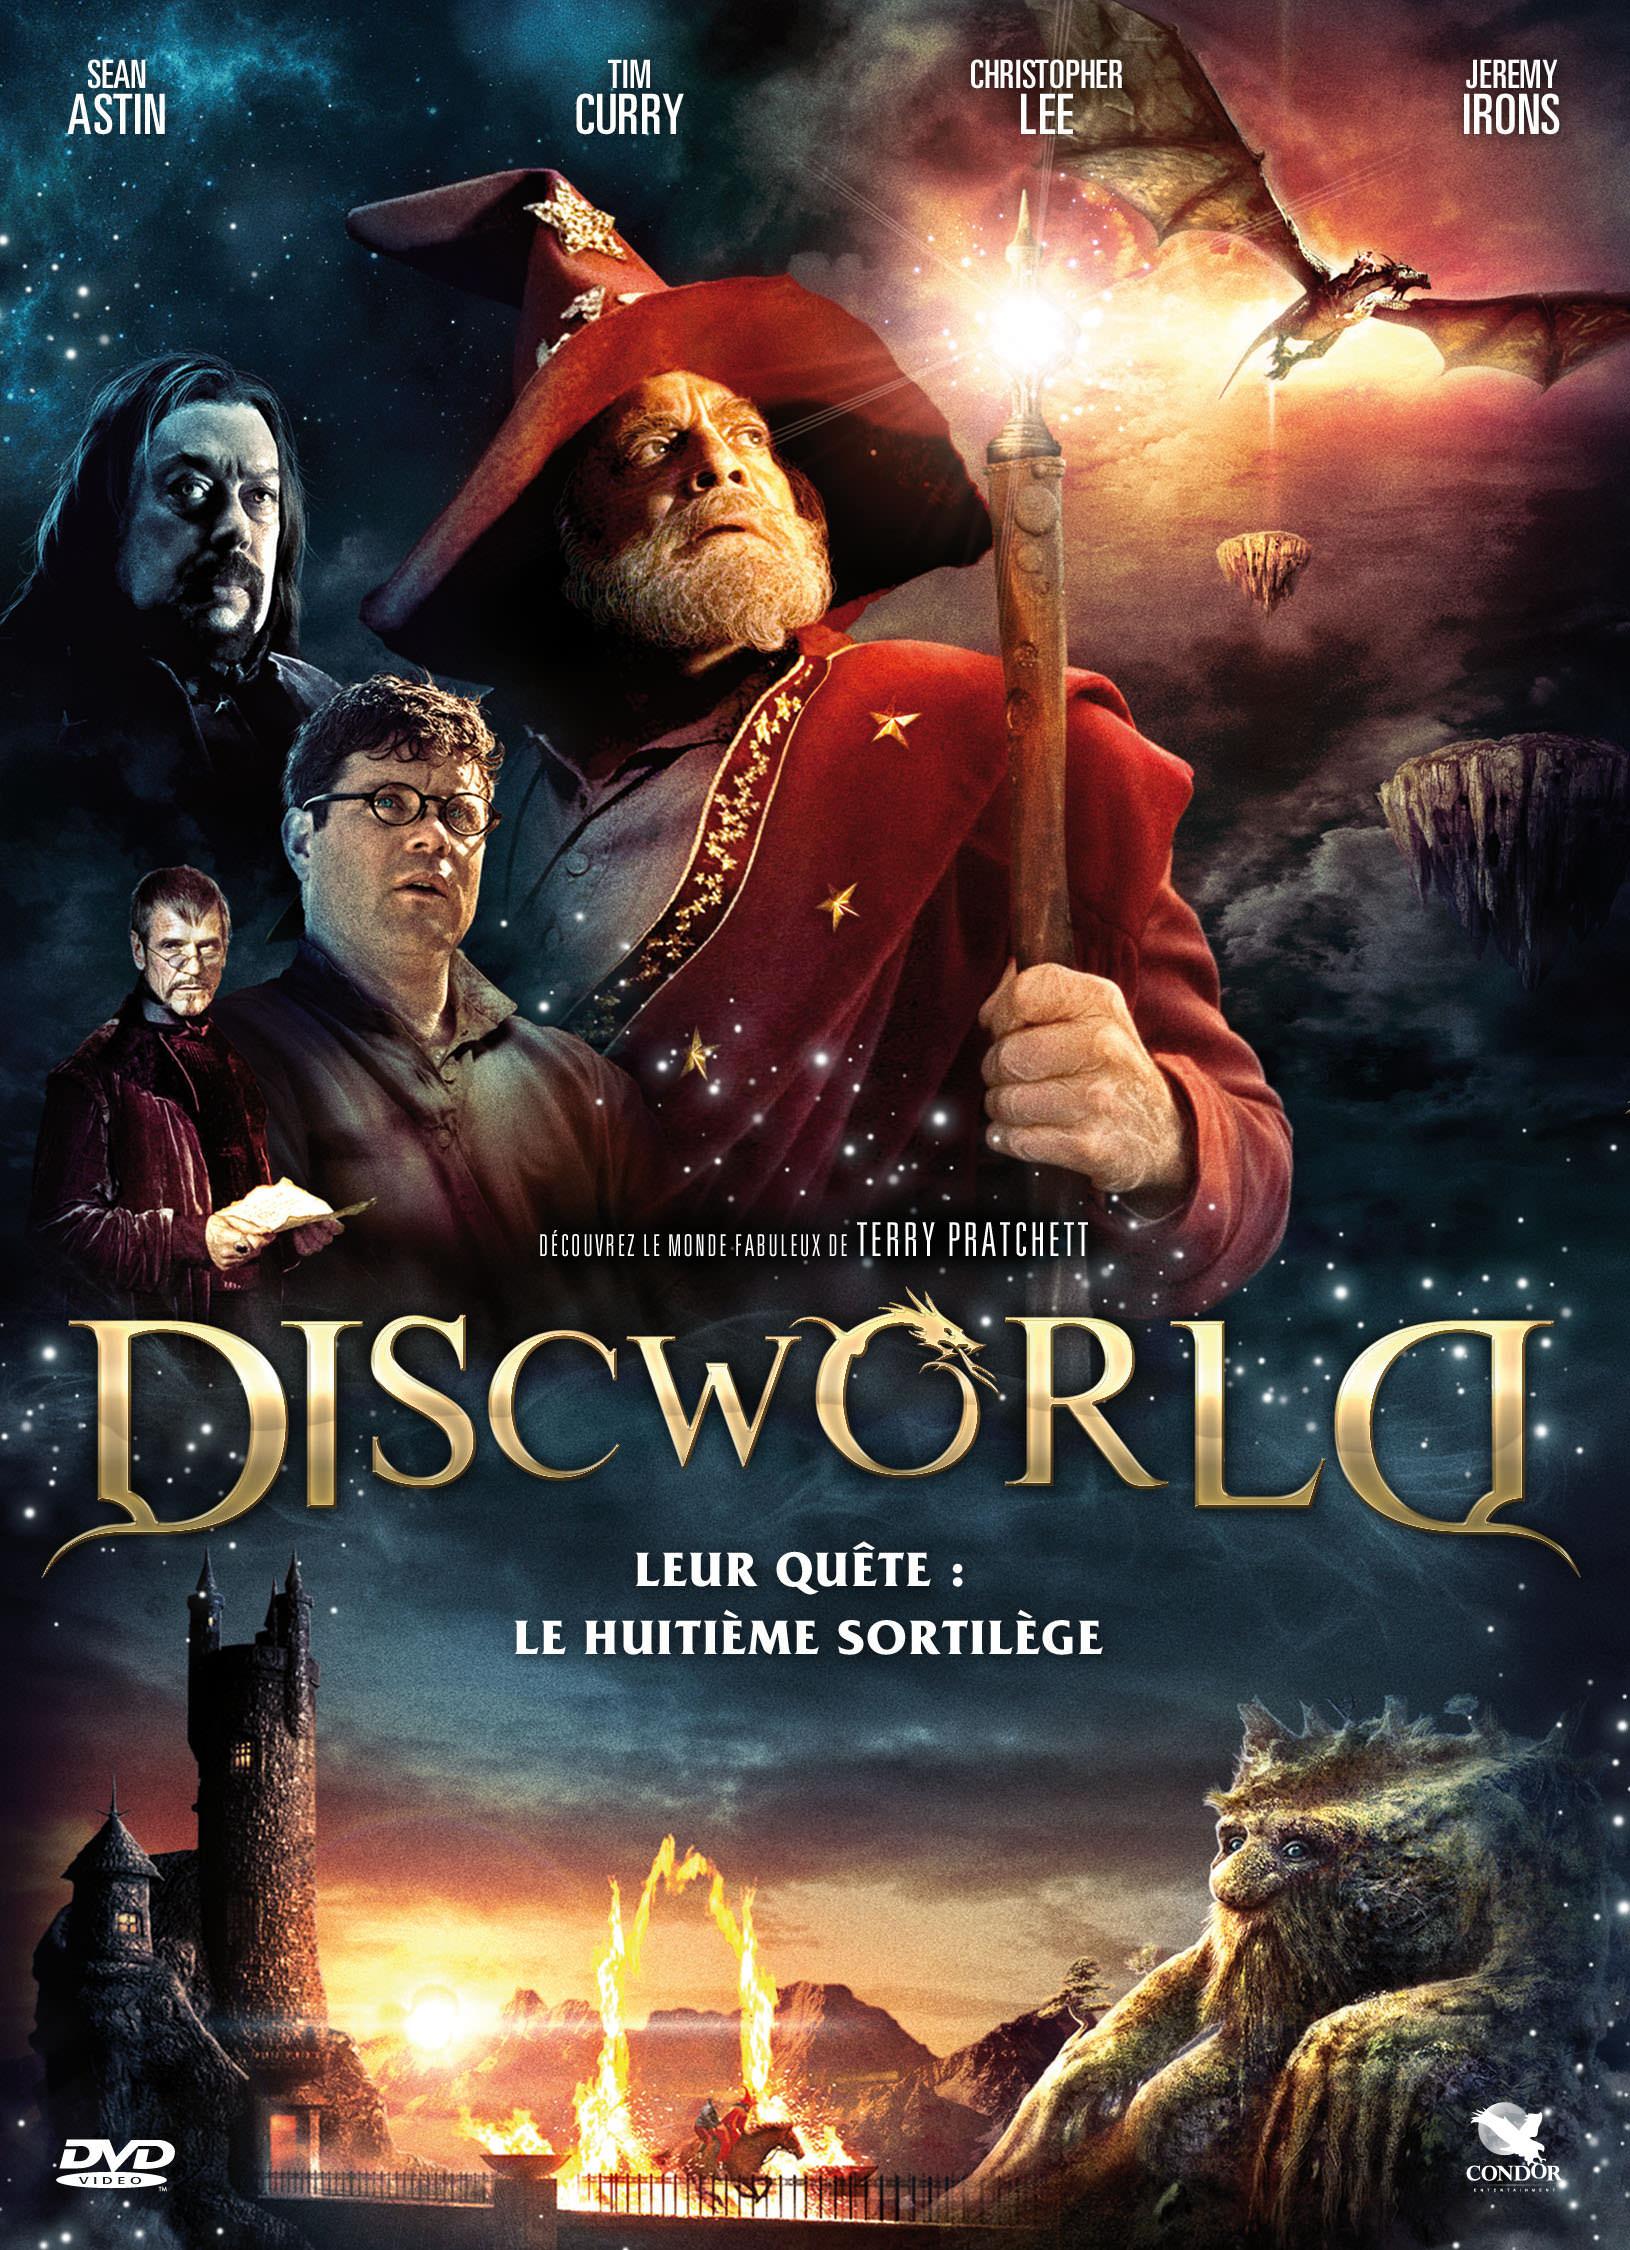 Discworld jean